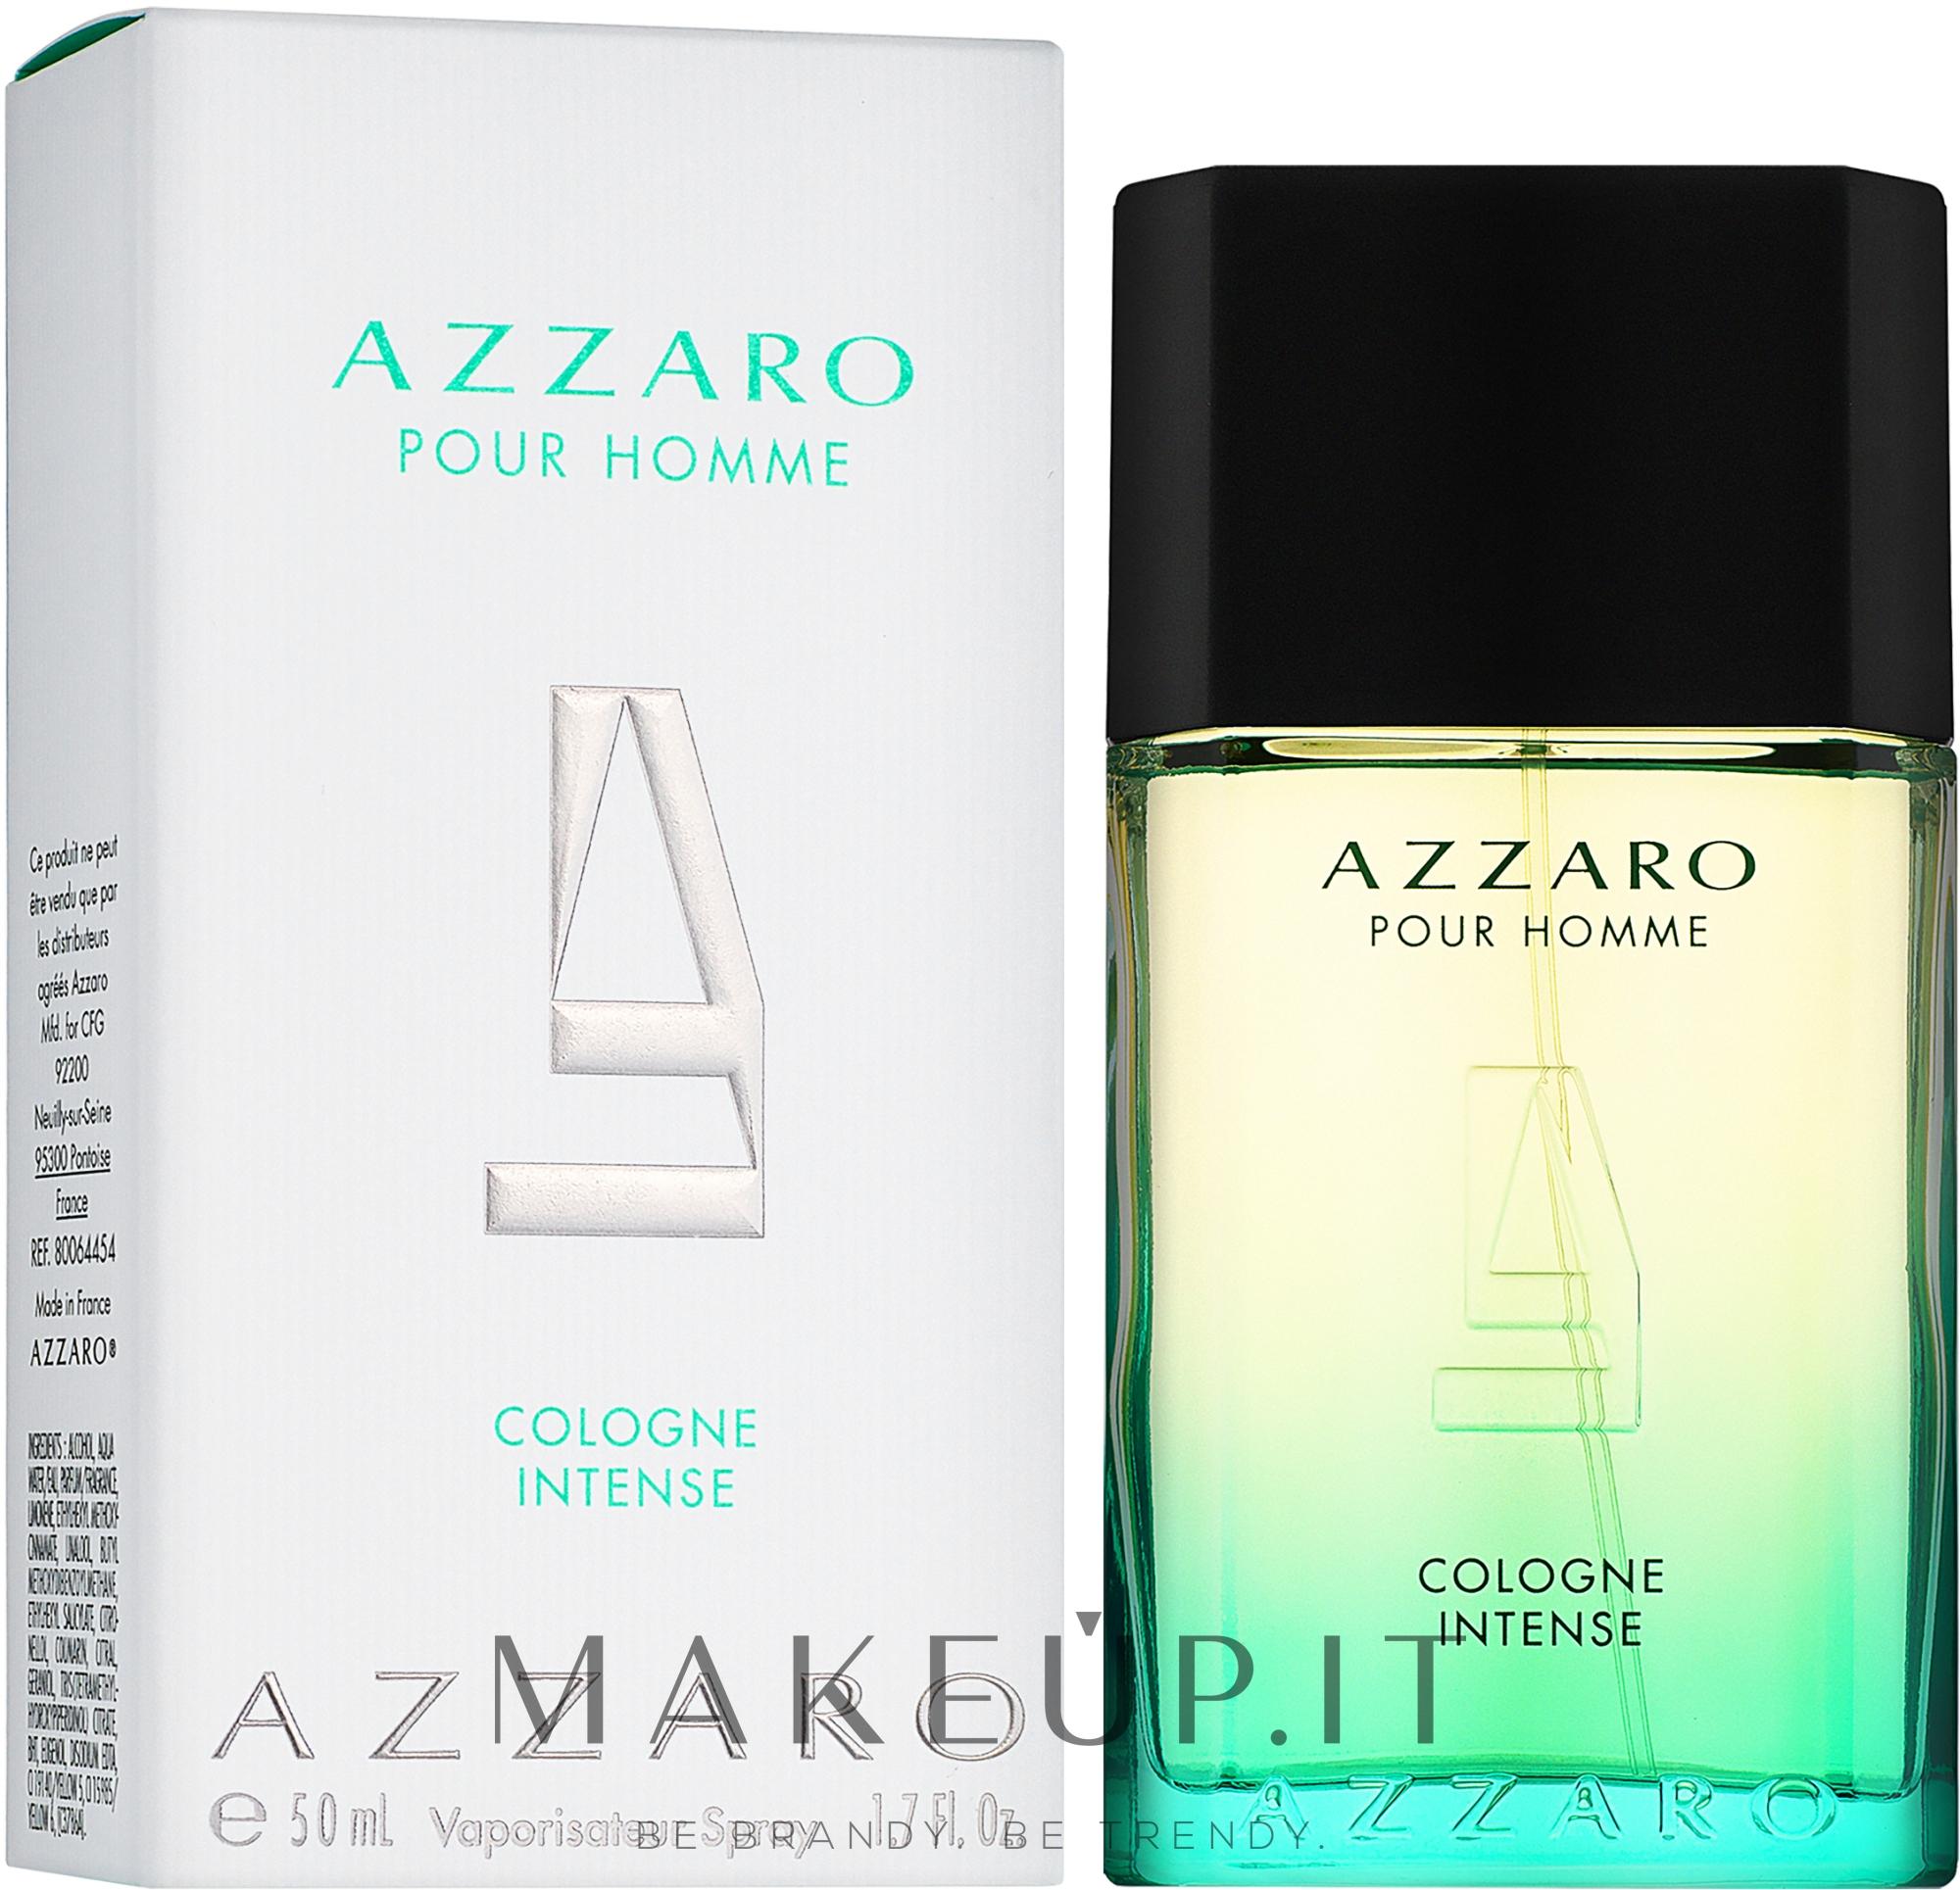 Azzaro Pour Homme Cologne Intense - Colonia — foto 50 ml